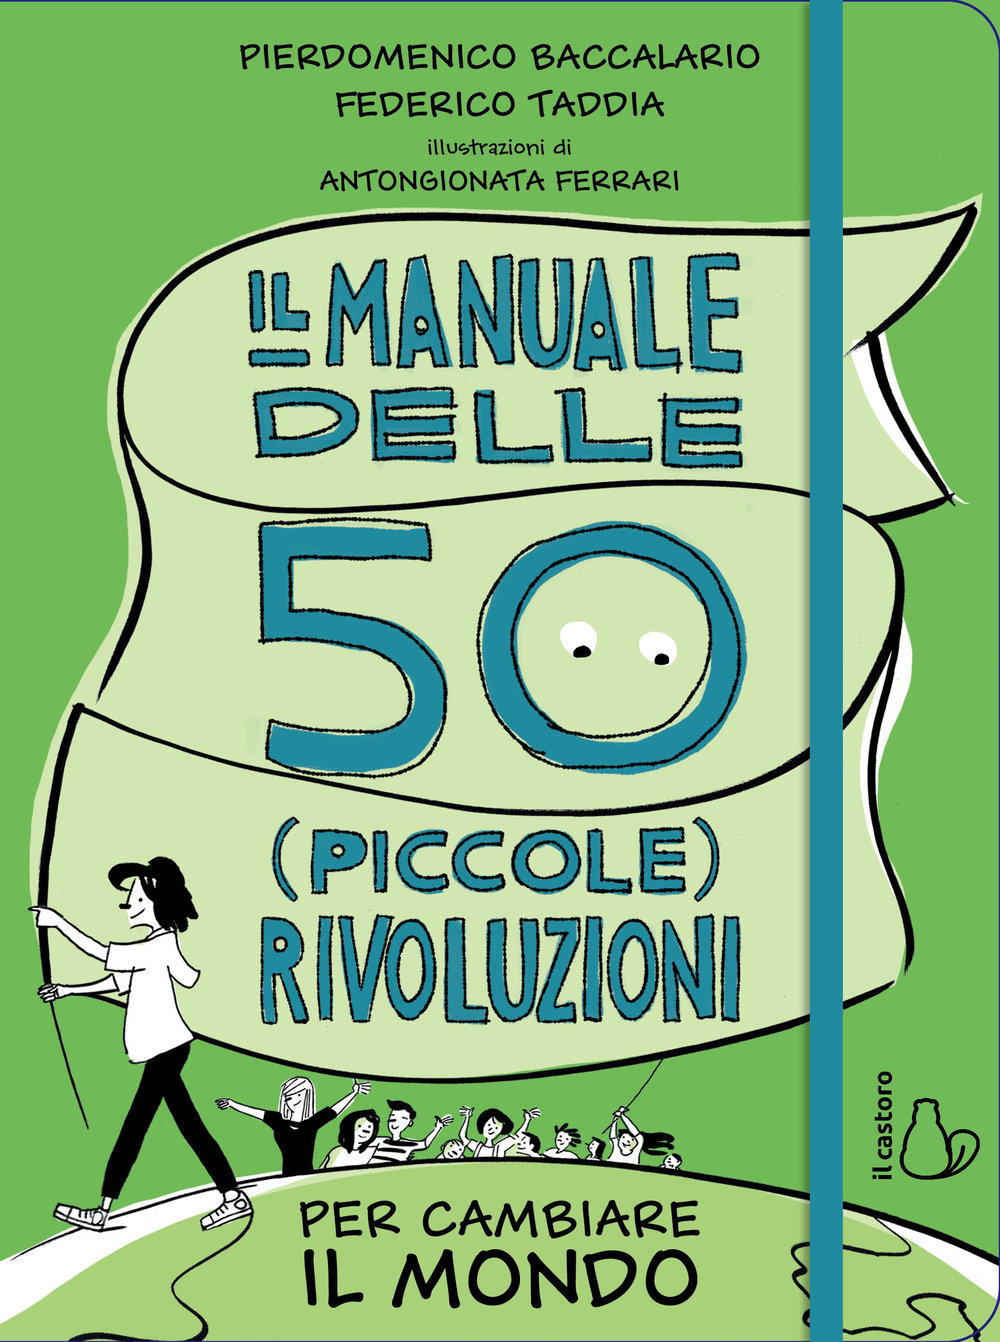 Manuale 50 rivoluzione_cover.jpg